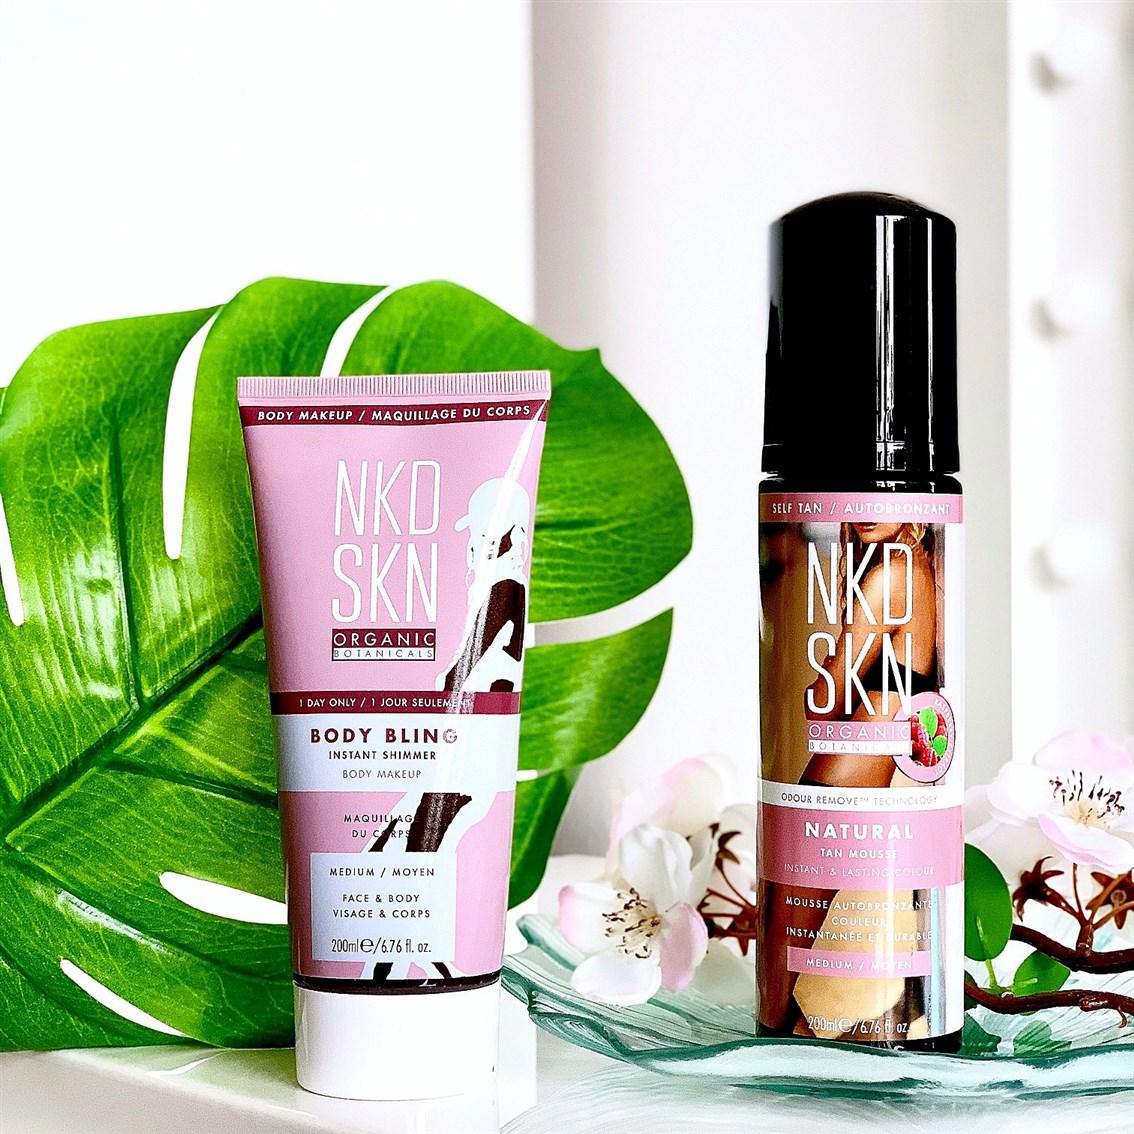 NKD SKN kosmetyki samoopalające blog